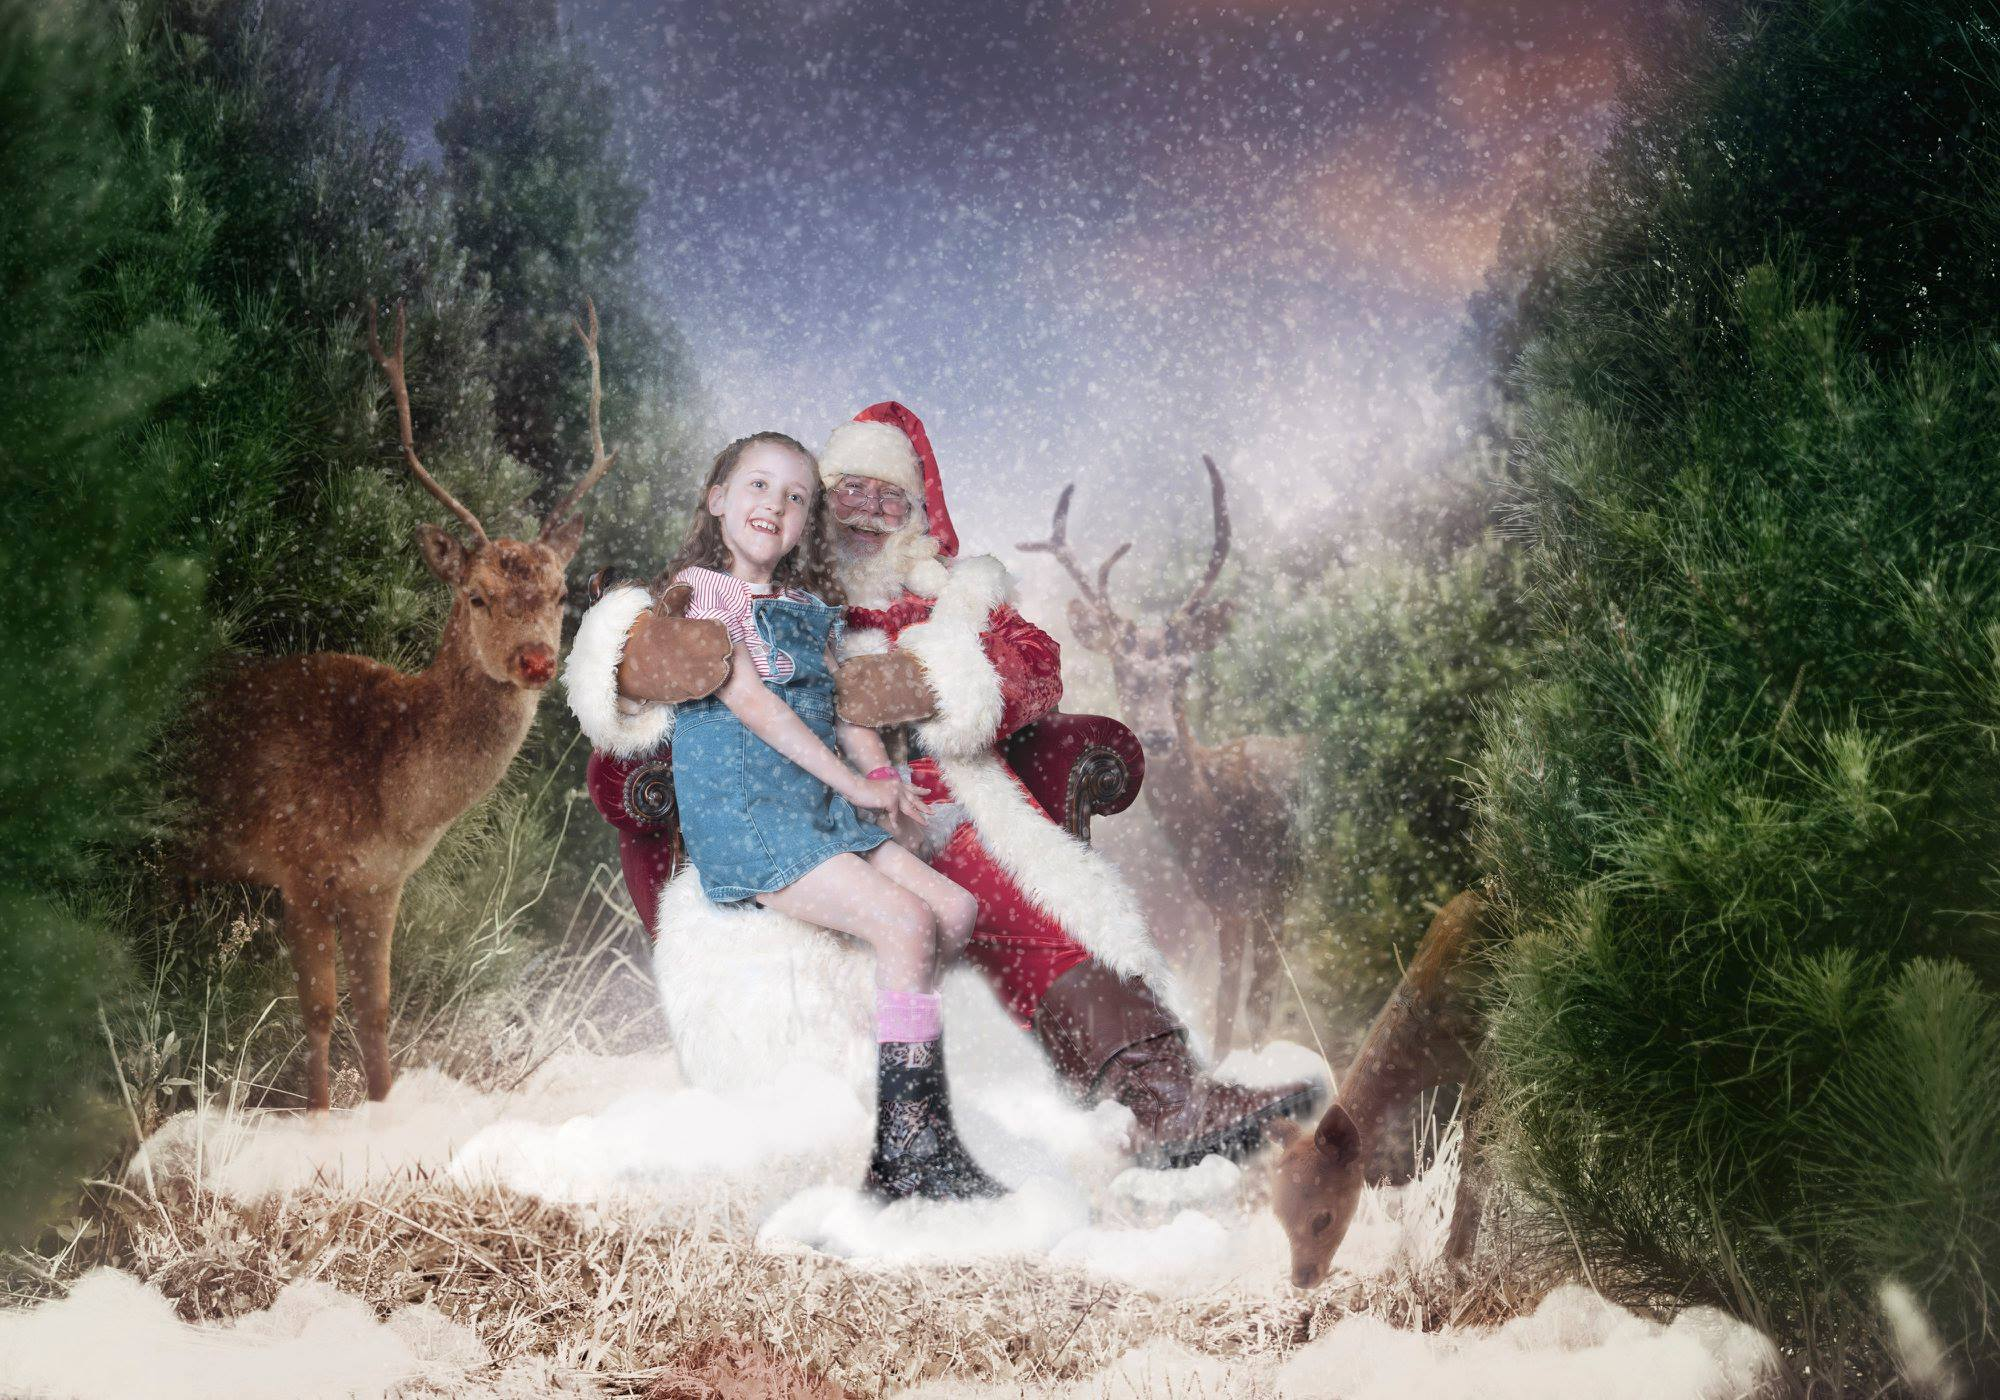 Chloe's Christmas